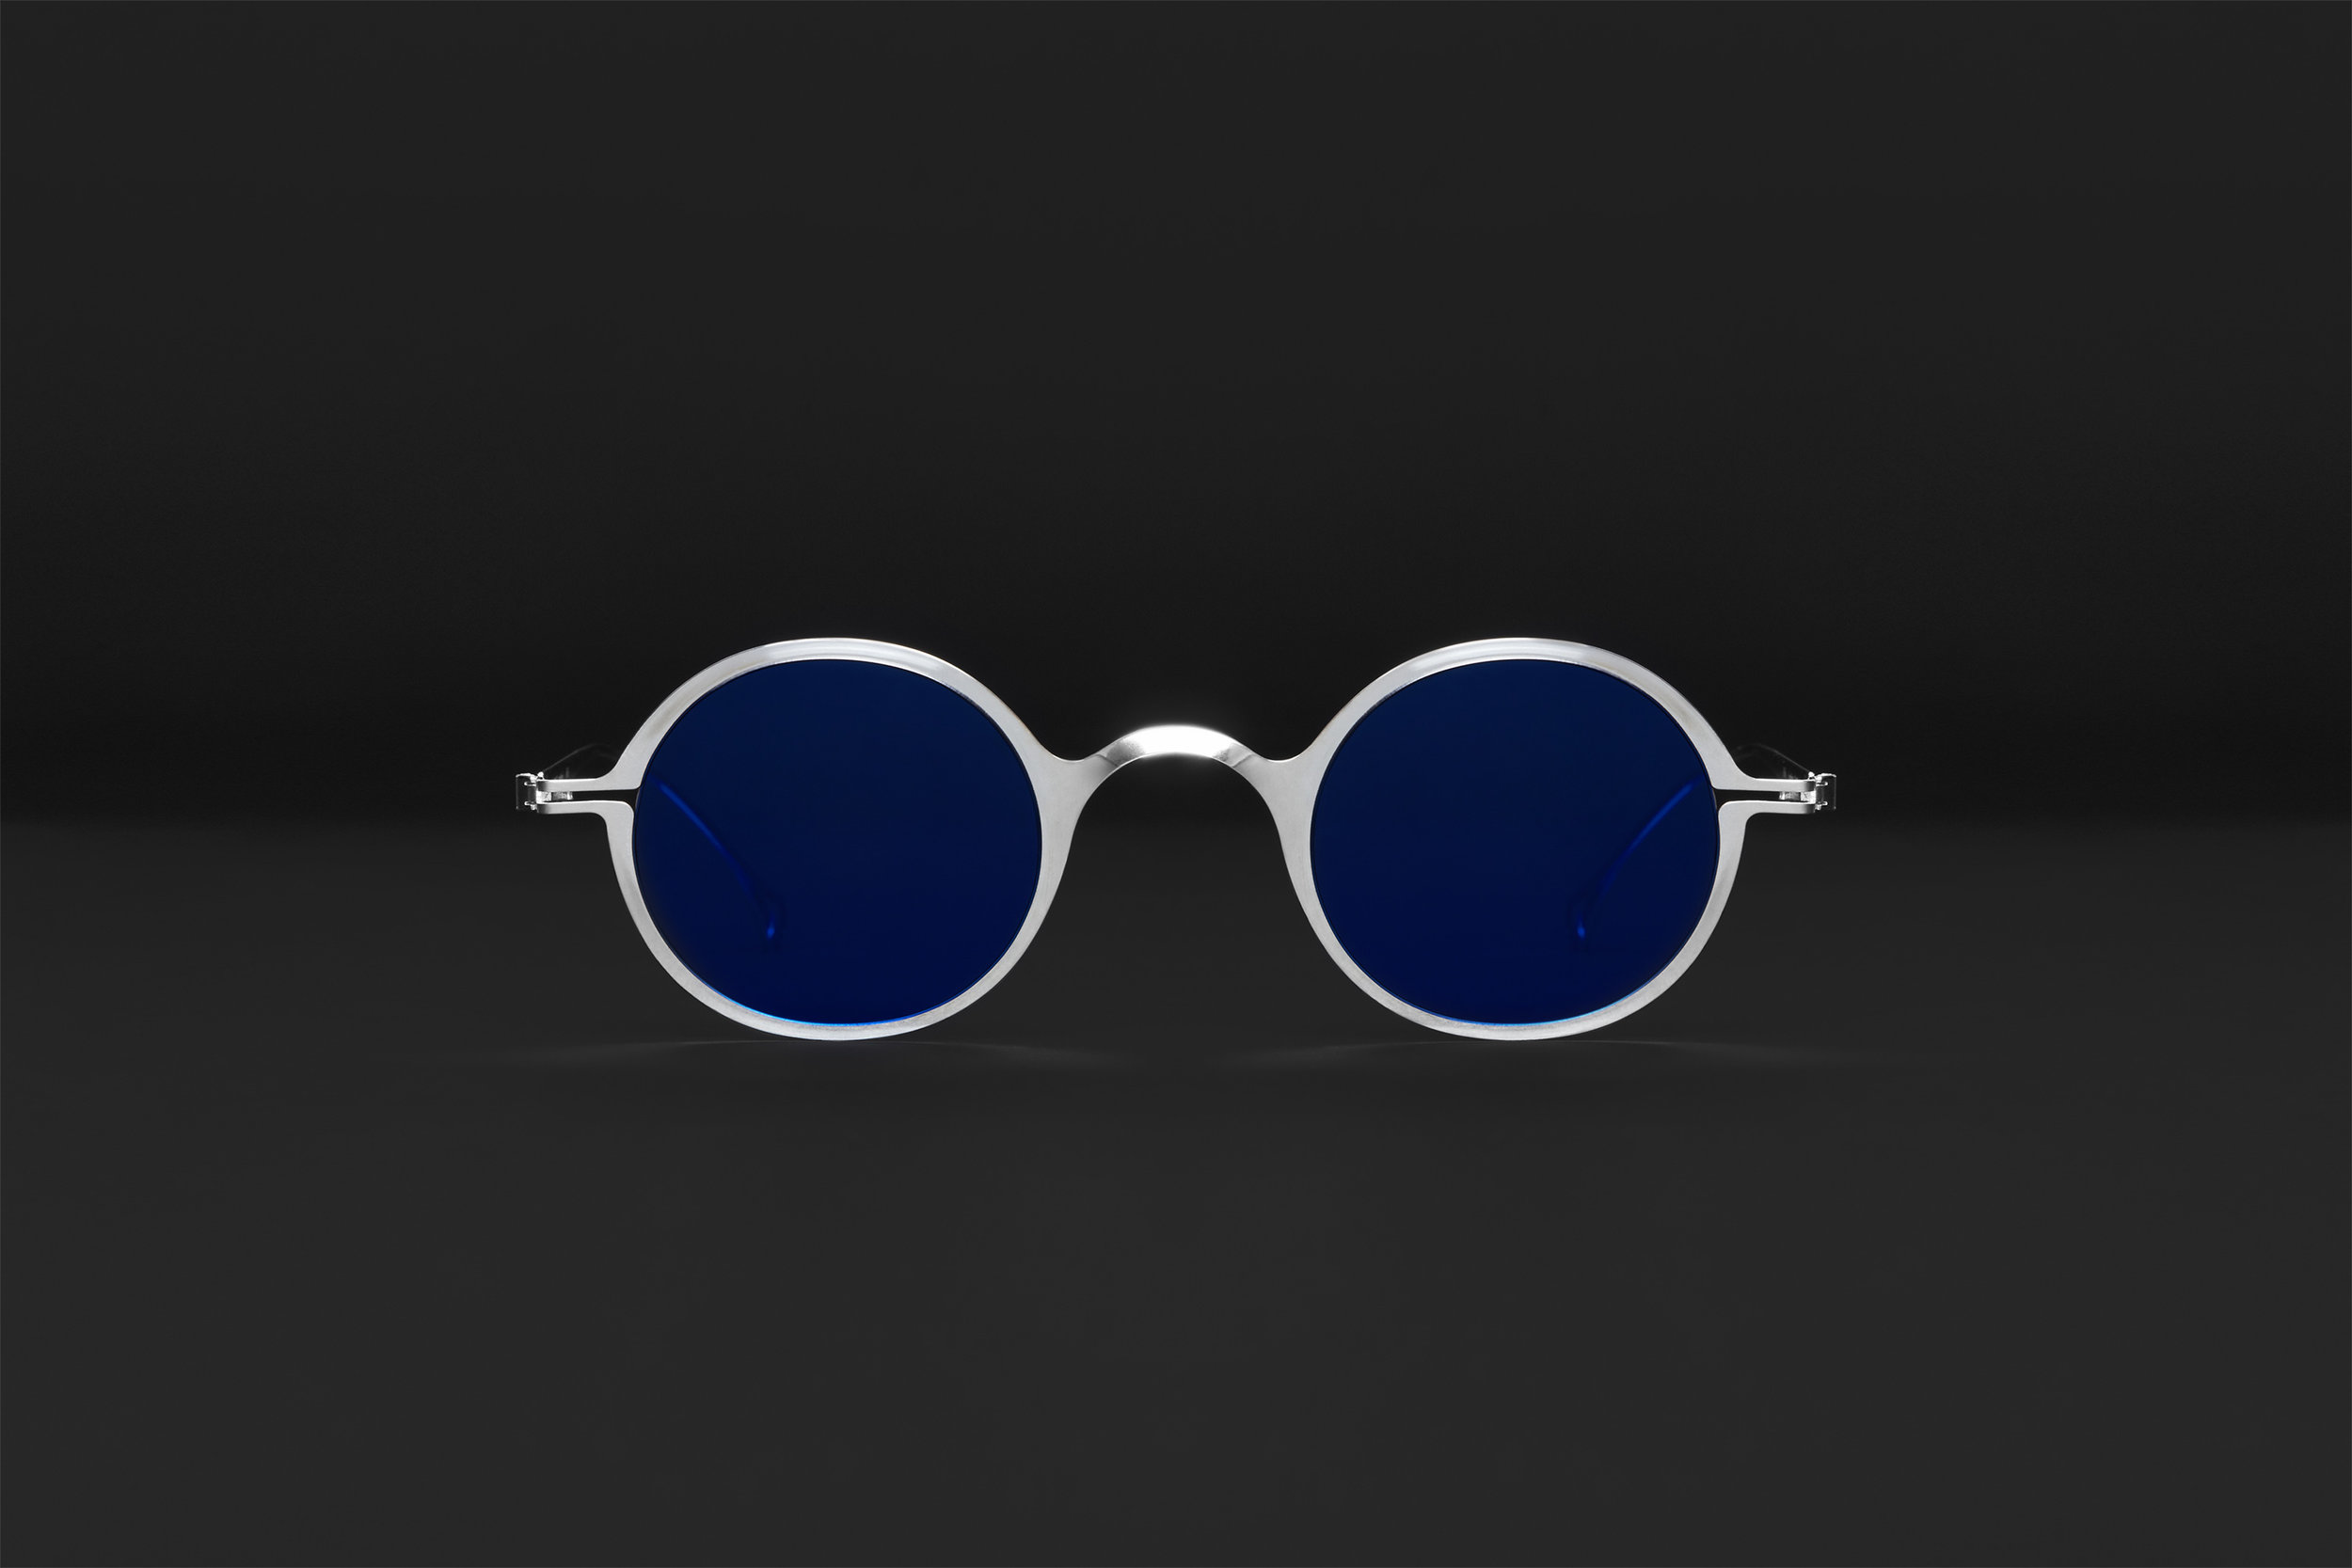 haffmans_neumeister_laudanum_argentum_litmus_blue_phasmid_sunglasses_front_102224.jpg